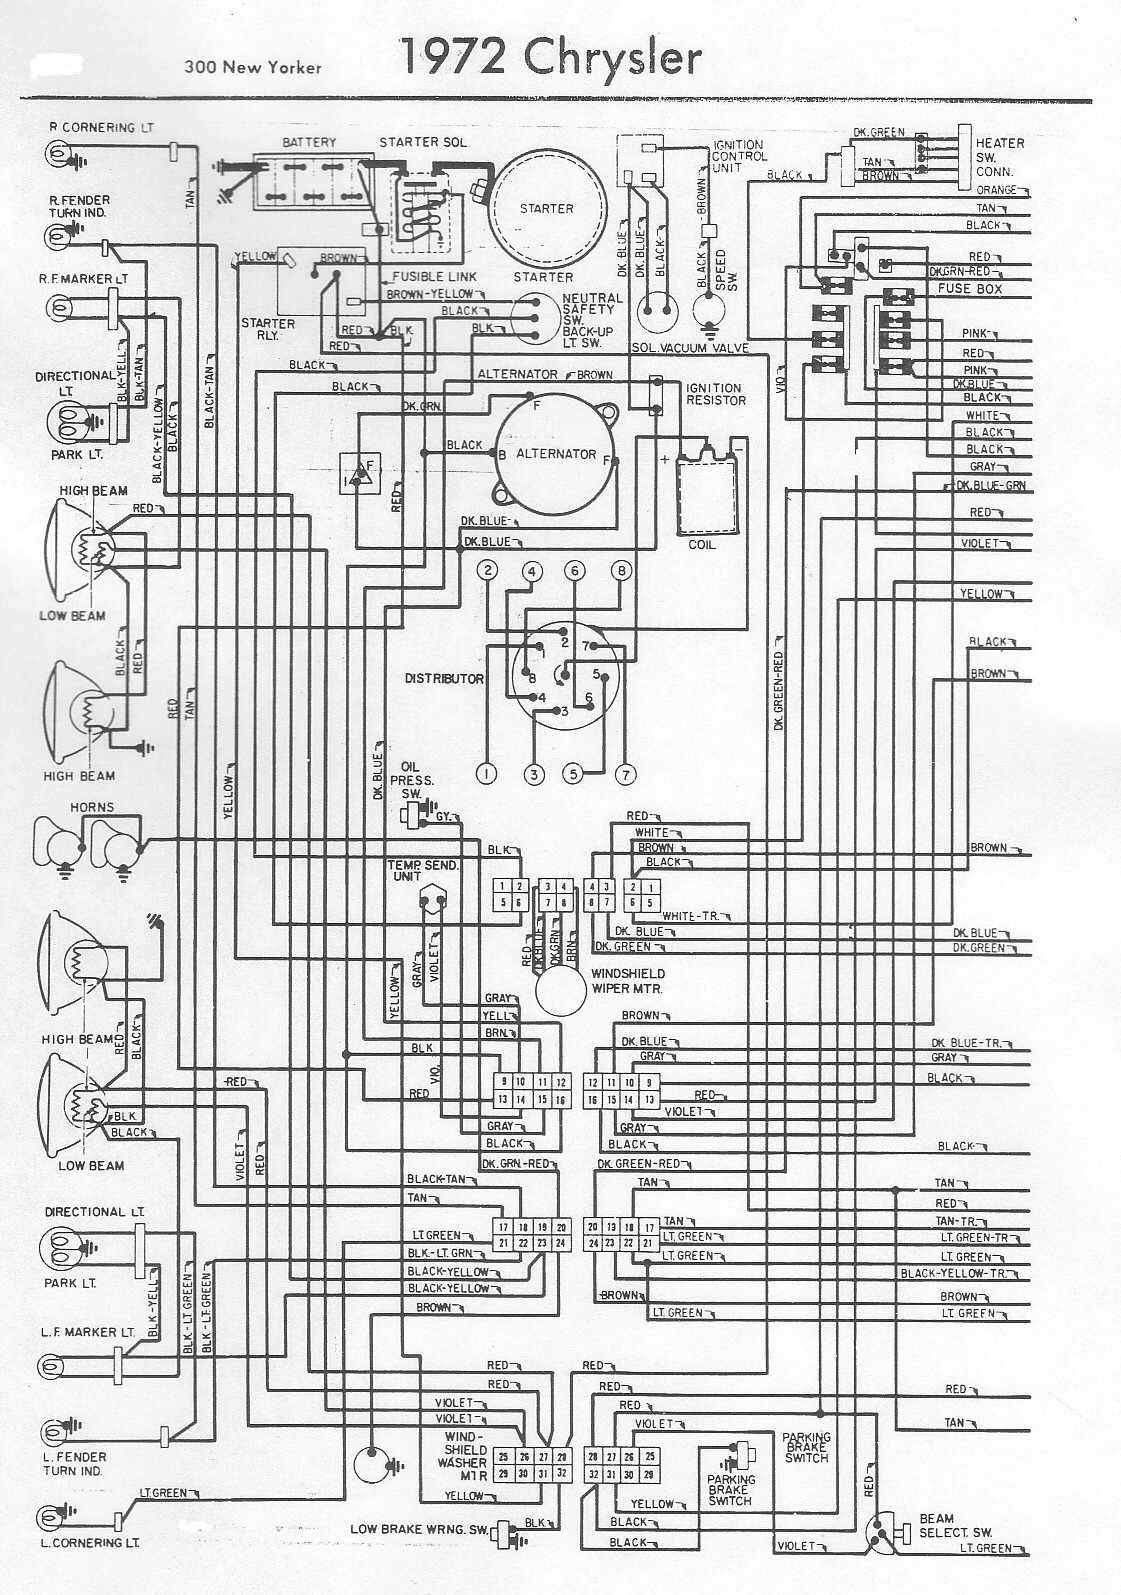 Boyer Electronic Ignition Wiring Diagrams - Wiring Data